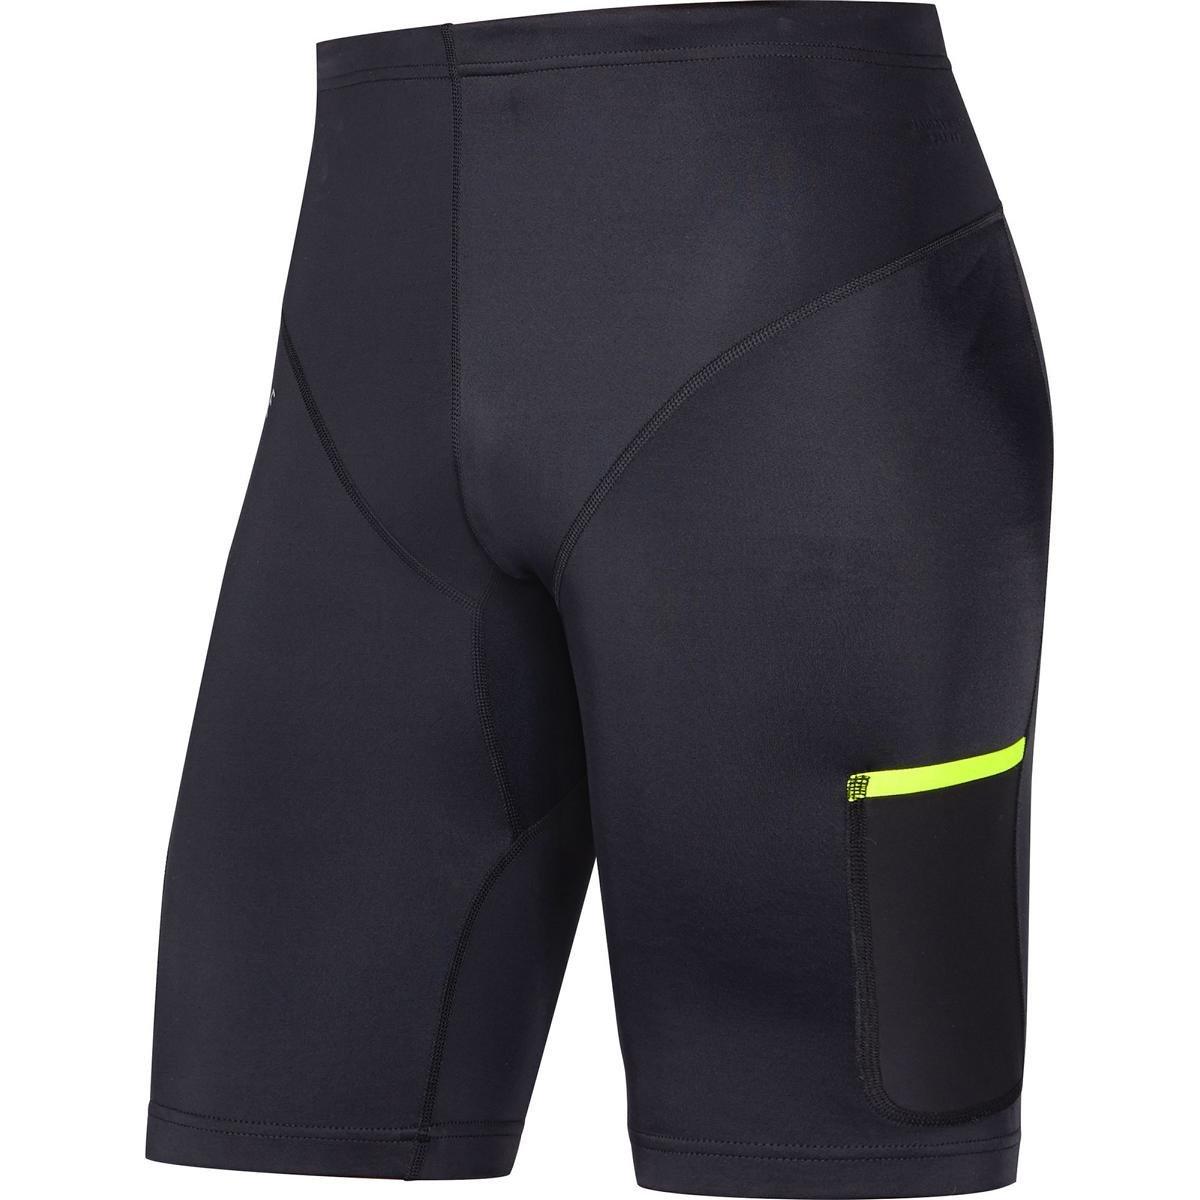 GORE Wear, Hombre, Mallas cortas transpirables para correr, GORE R7 Short Tights, 100103